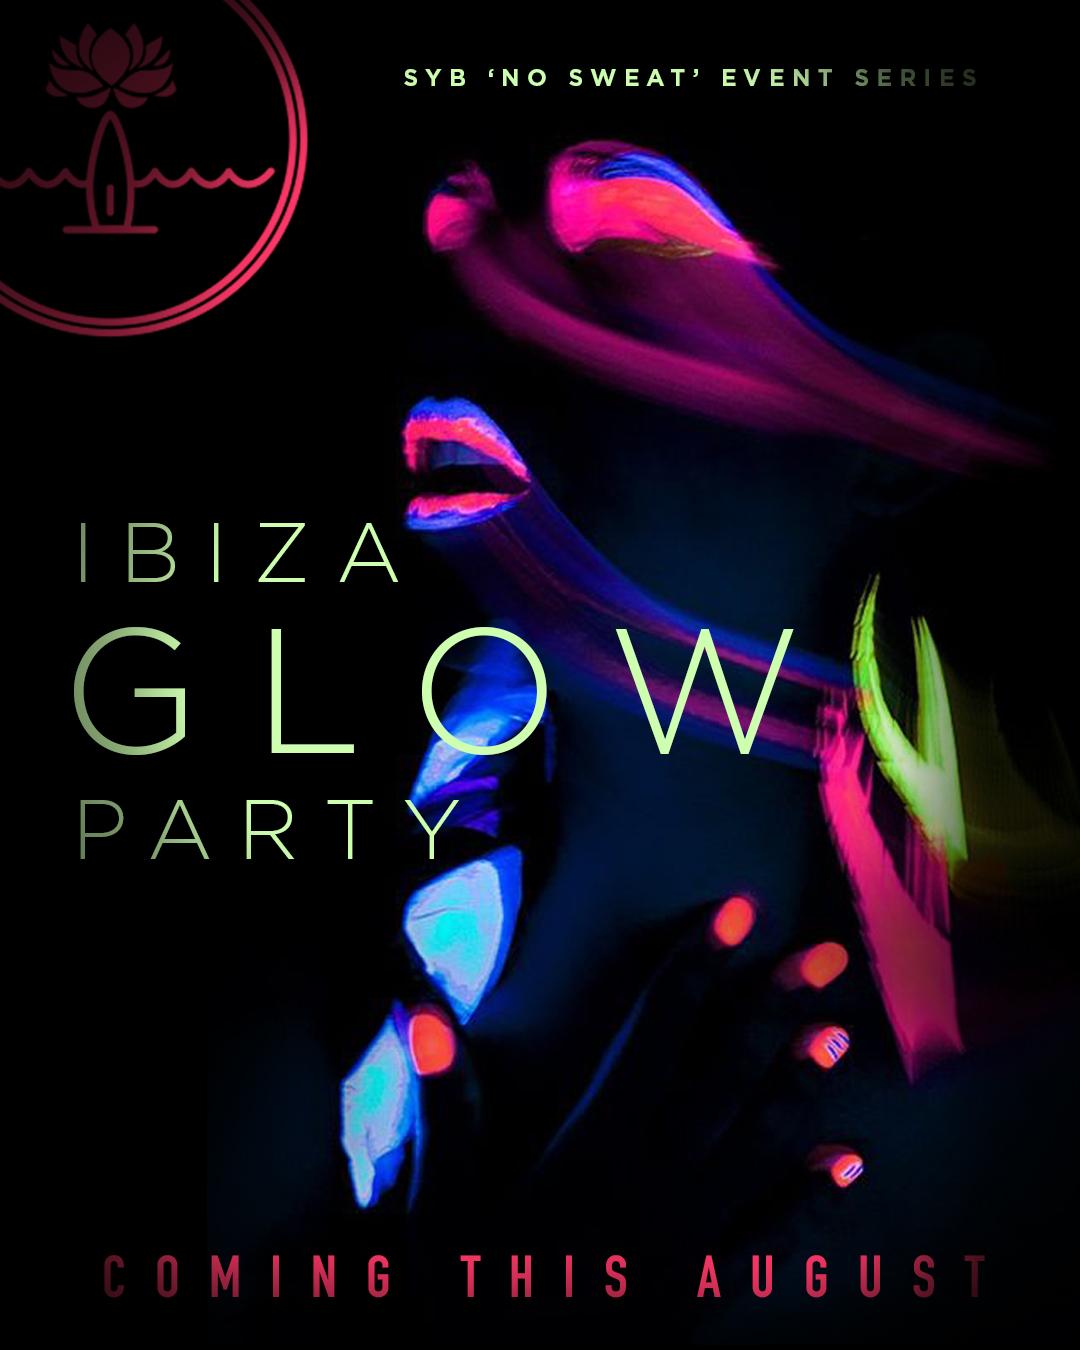 SYB_GLOW_PARTY.jpg